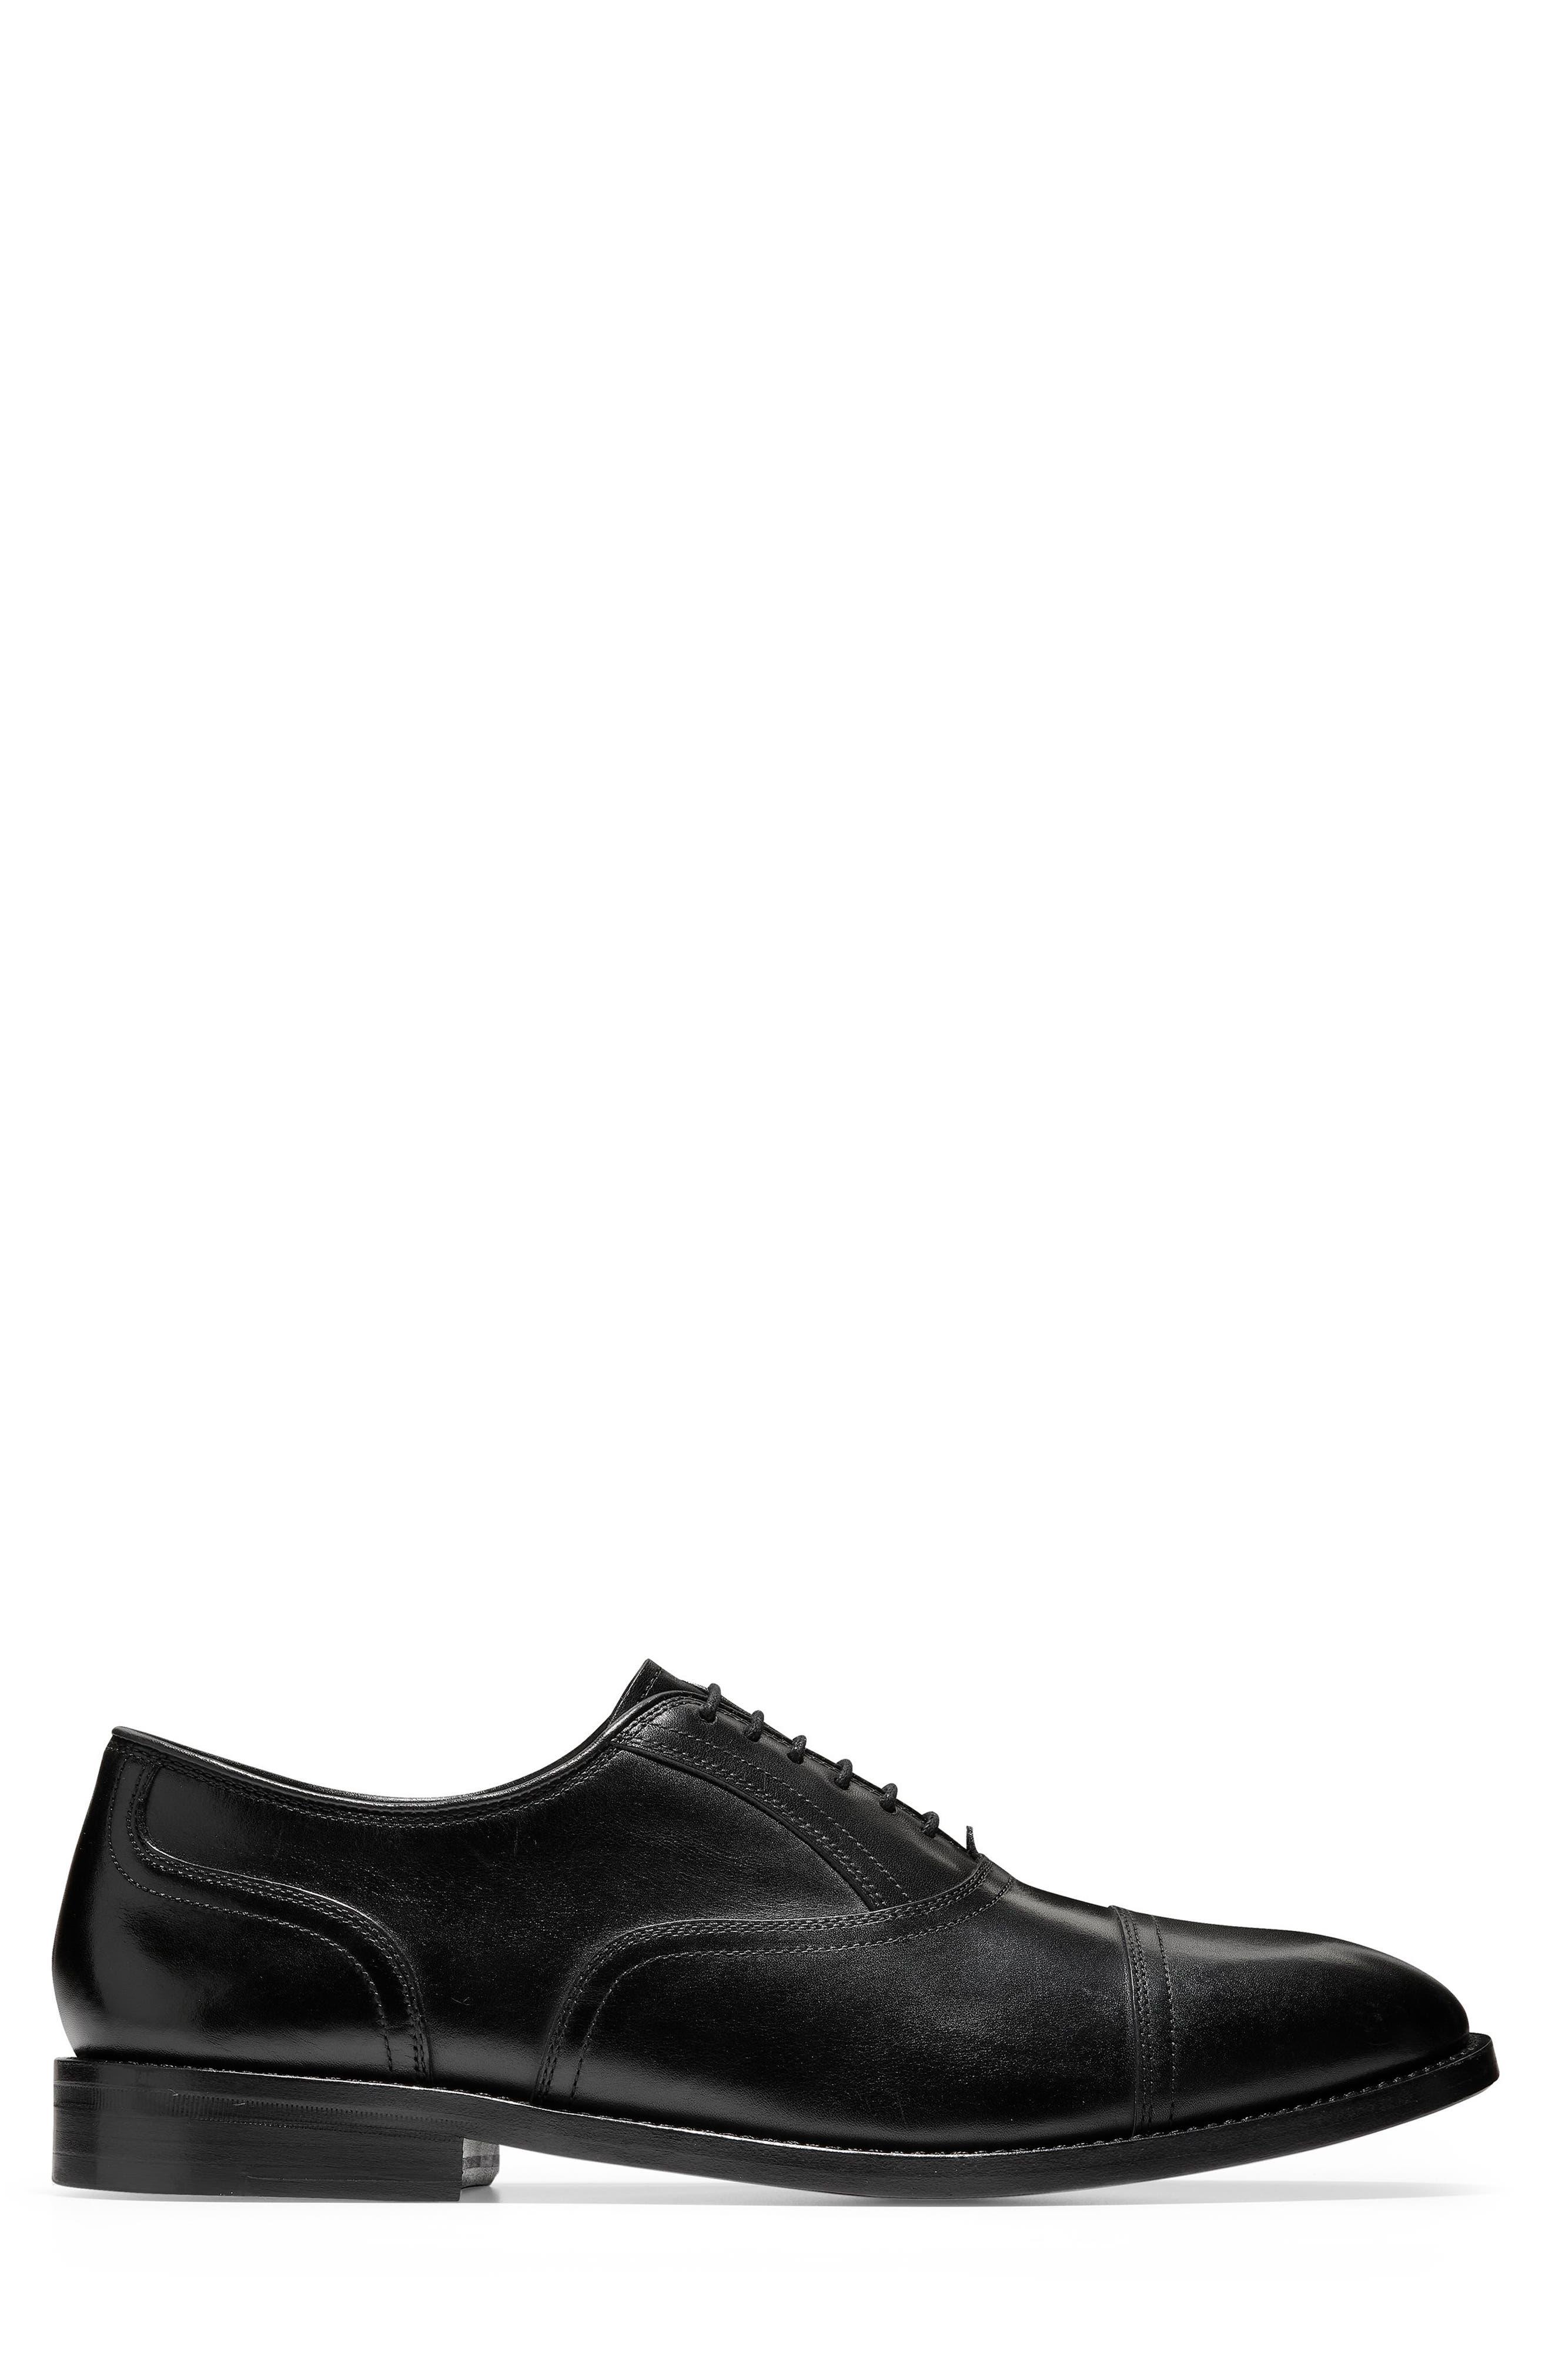 American Classics Kneeland Cap Toe Oxford,                             Alternate thumbnail 3, color,                             BLACK LEATHER